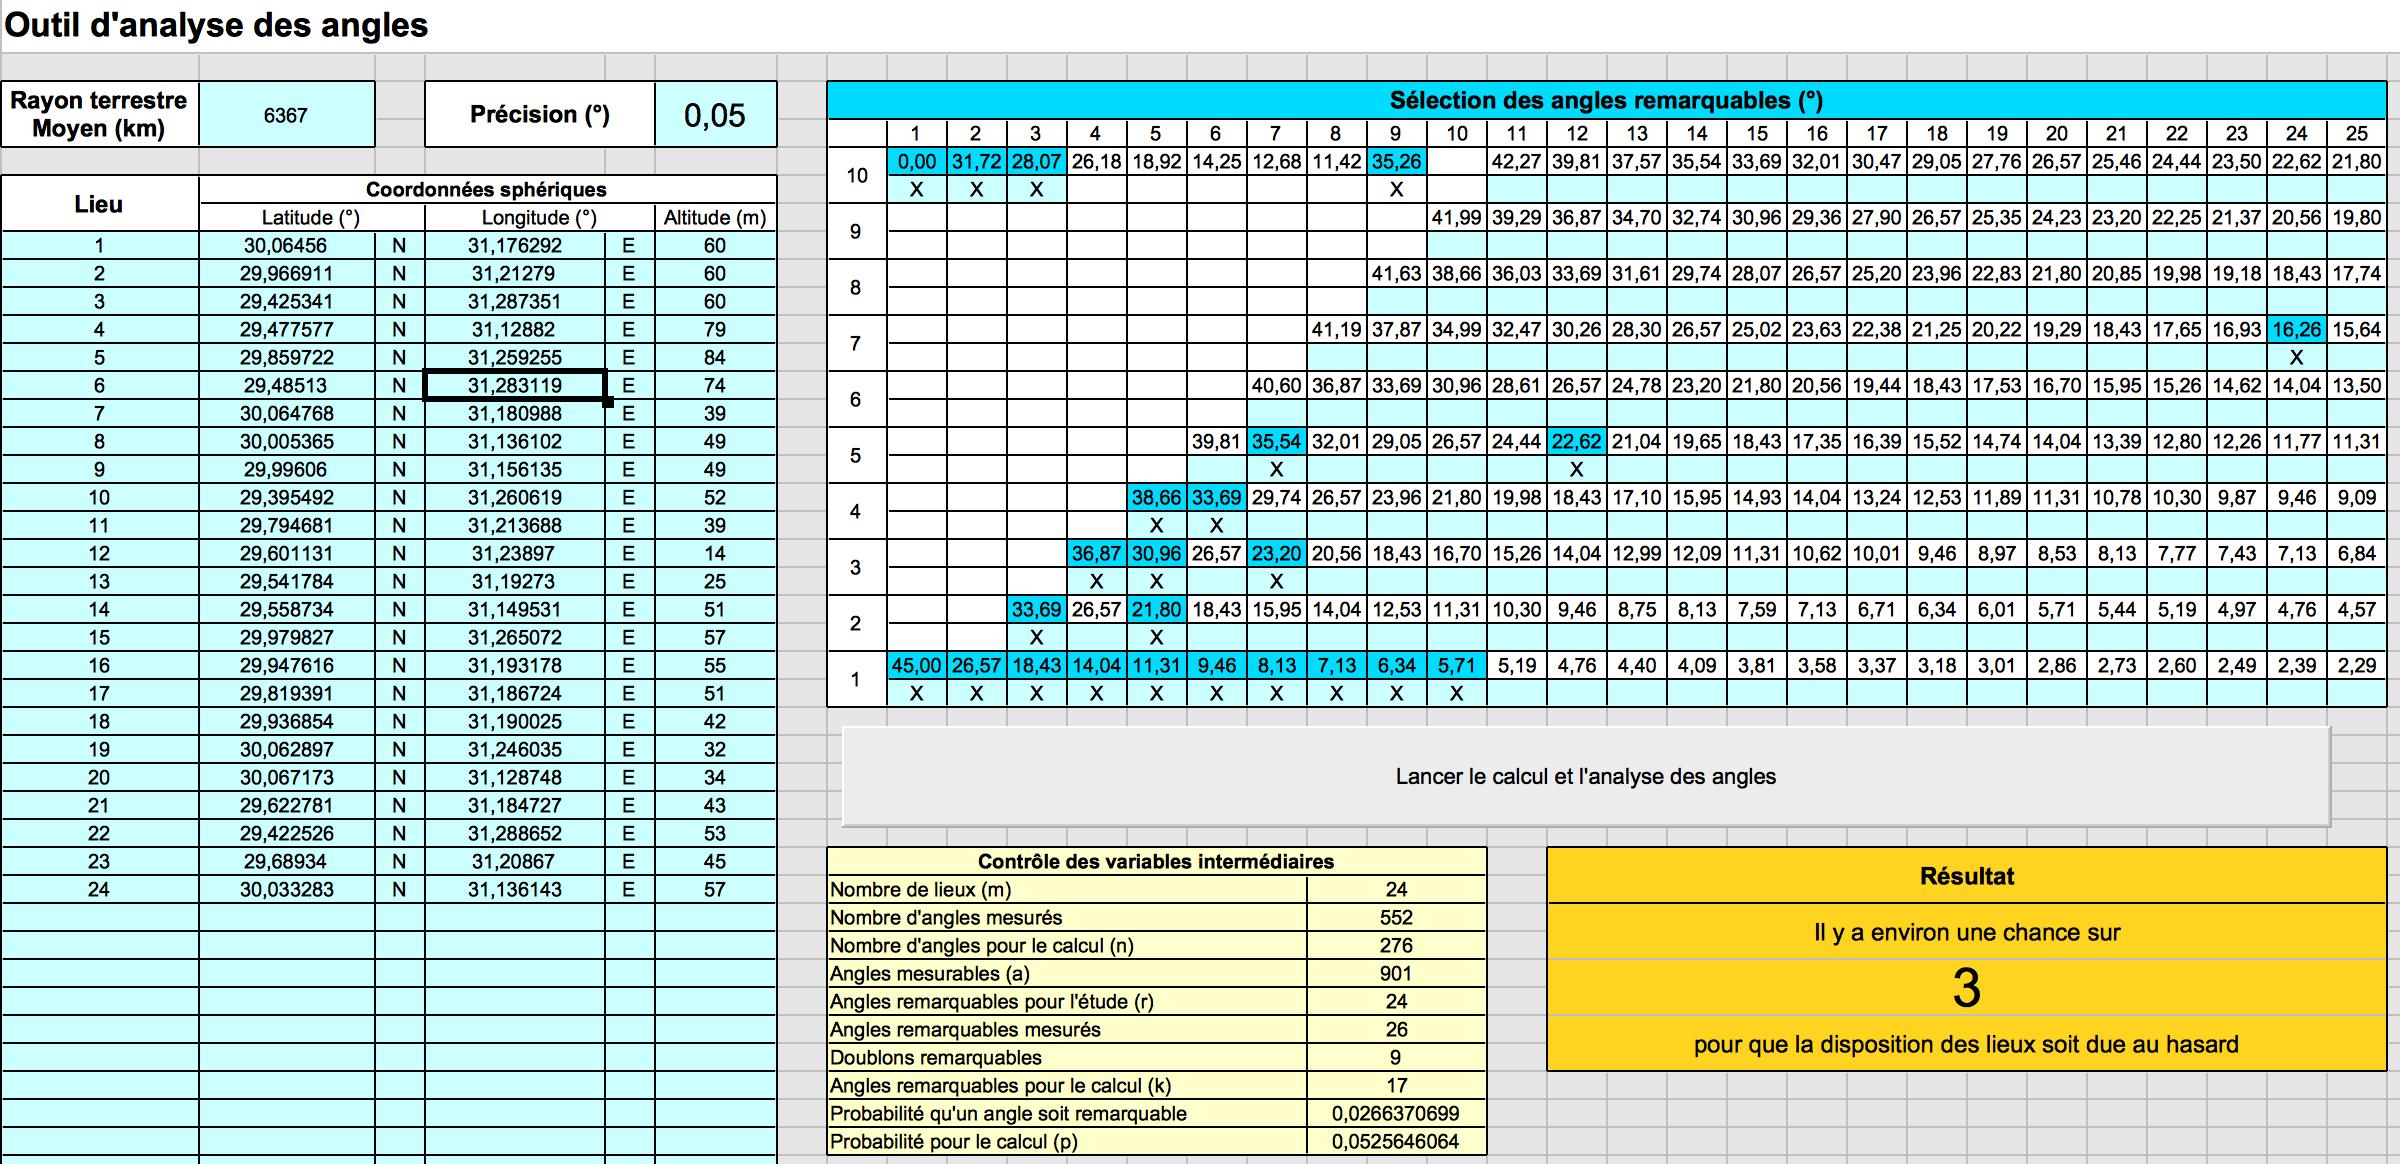 2017-11-06 11:03:14